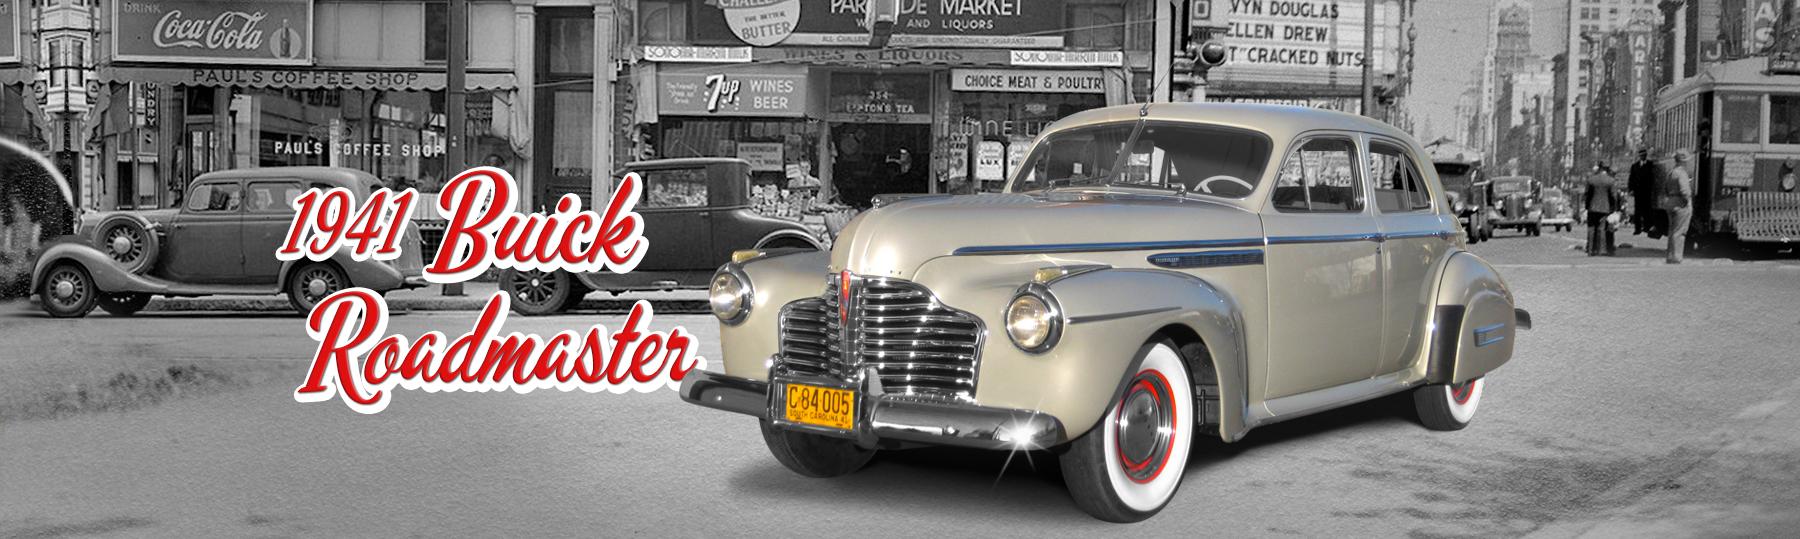 Fineline-41-Buick-header-1c